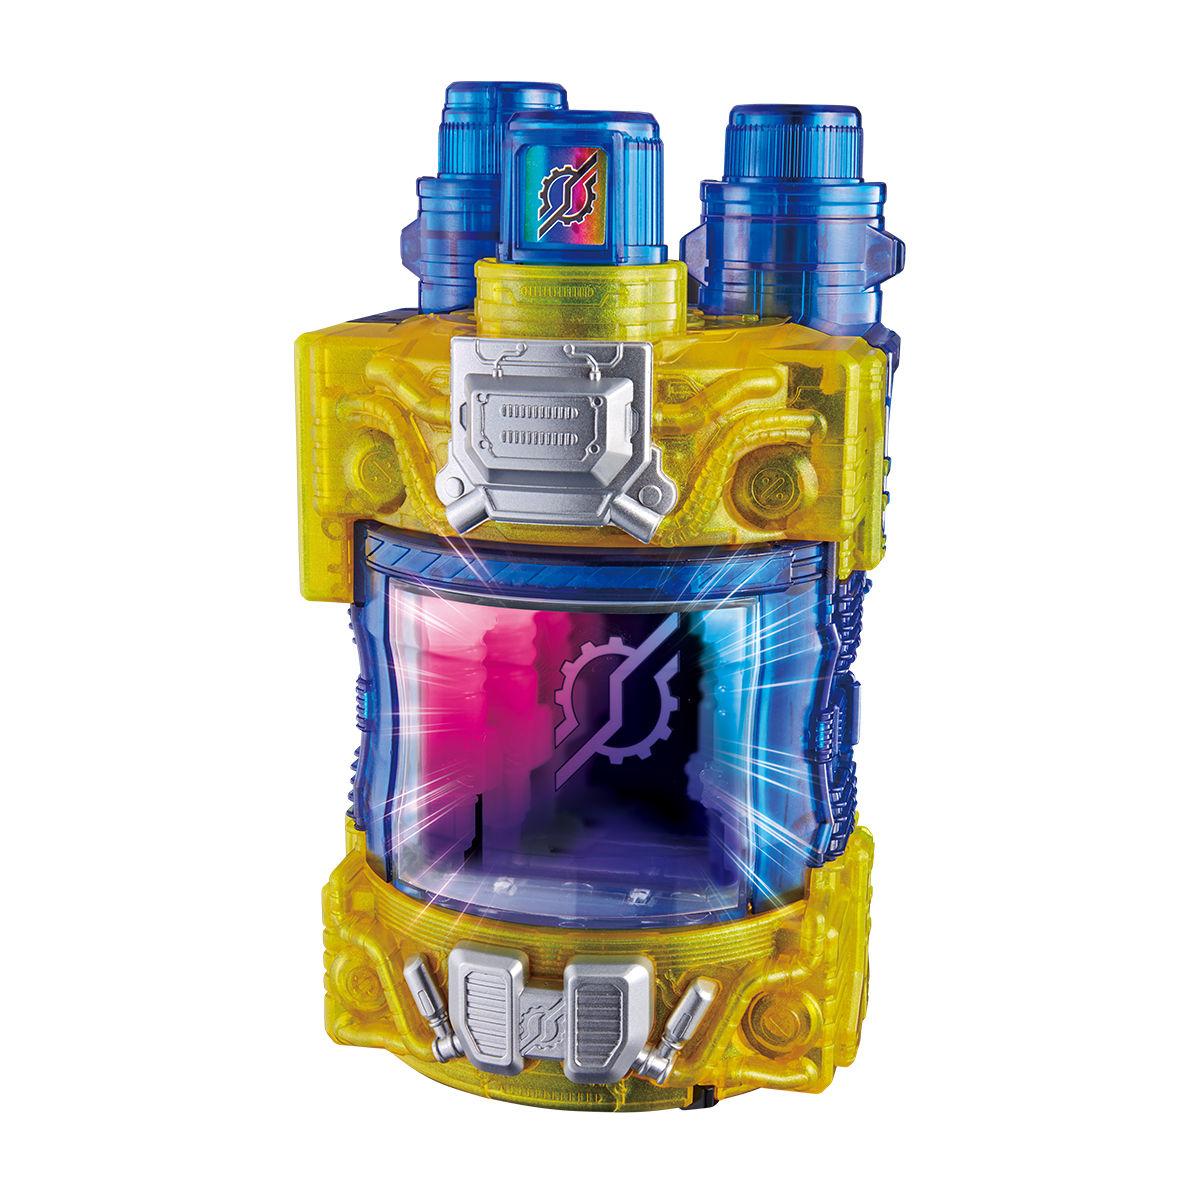 DXジーニアスフルボトル 仮面ライダービルド